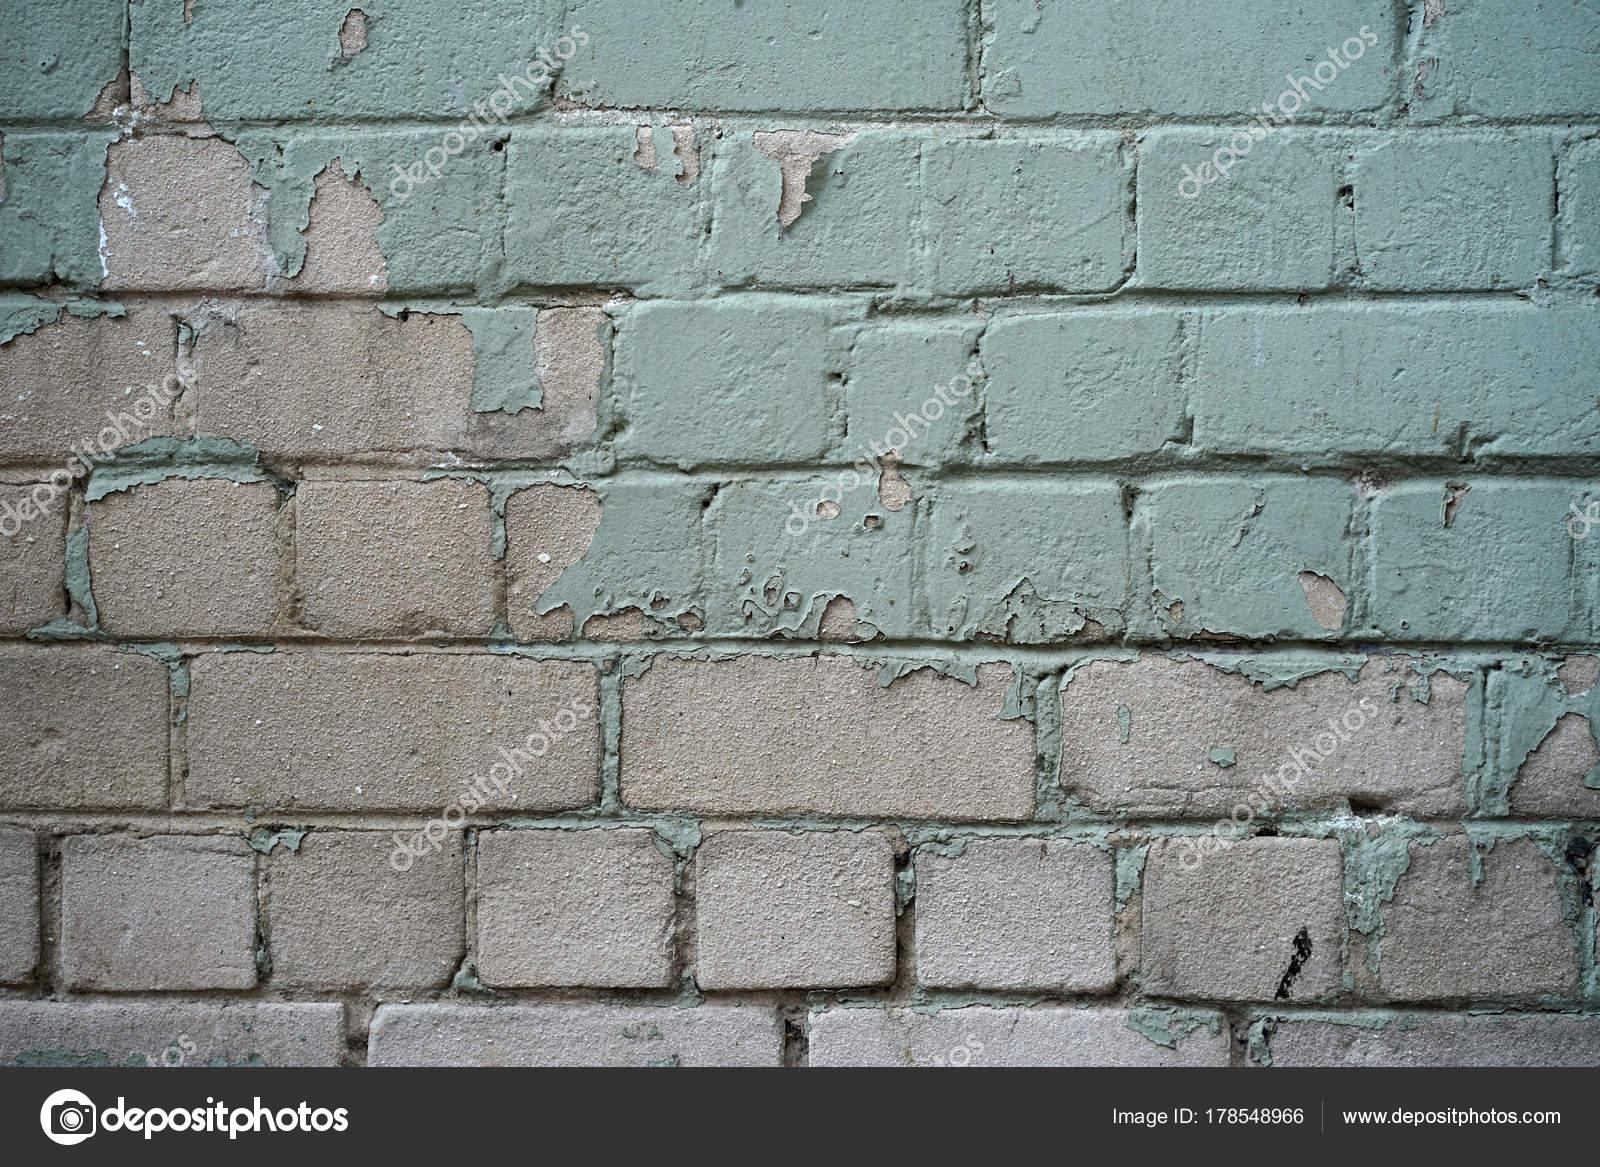 Stenen Muur Verven : Bakstenen muur met groene verf peeling u stockfoto svershinsky